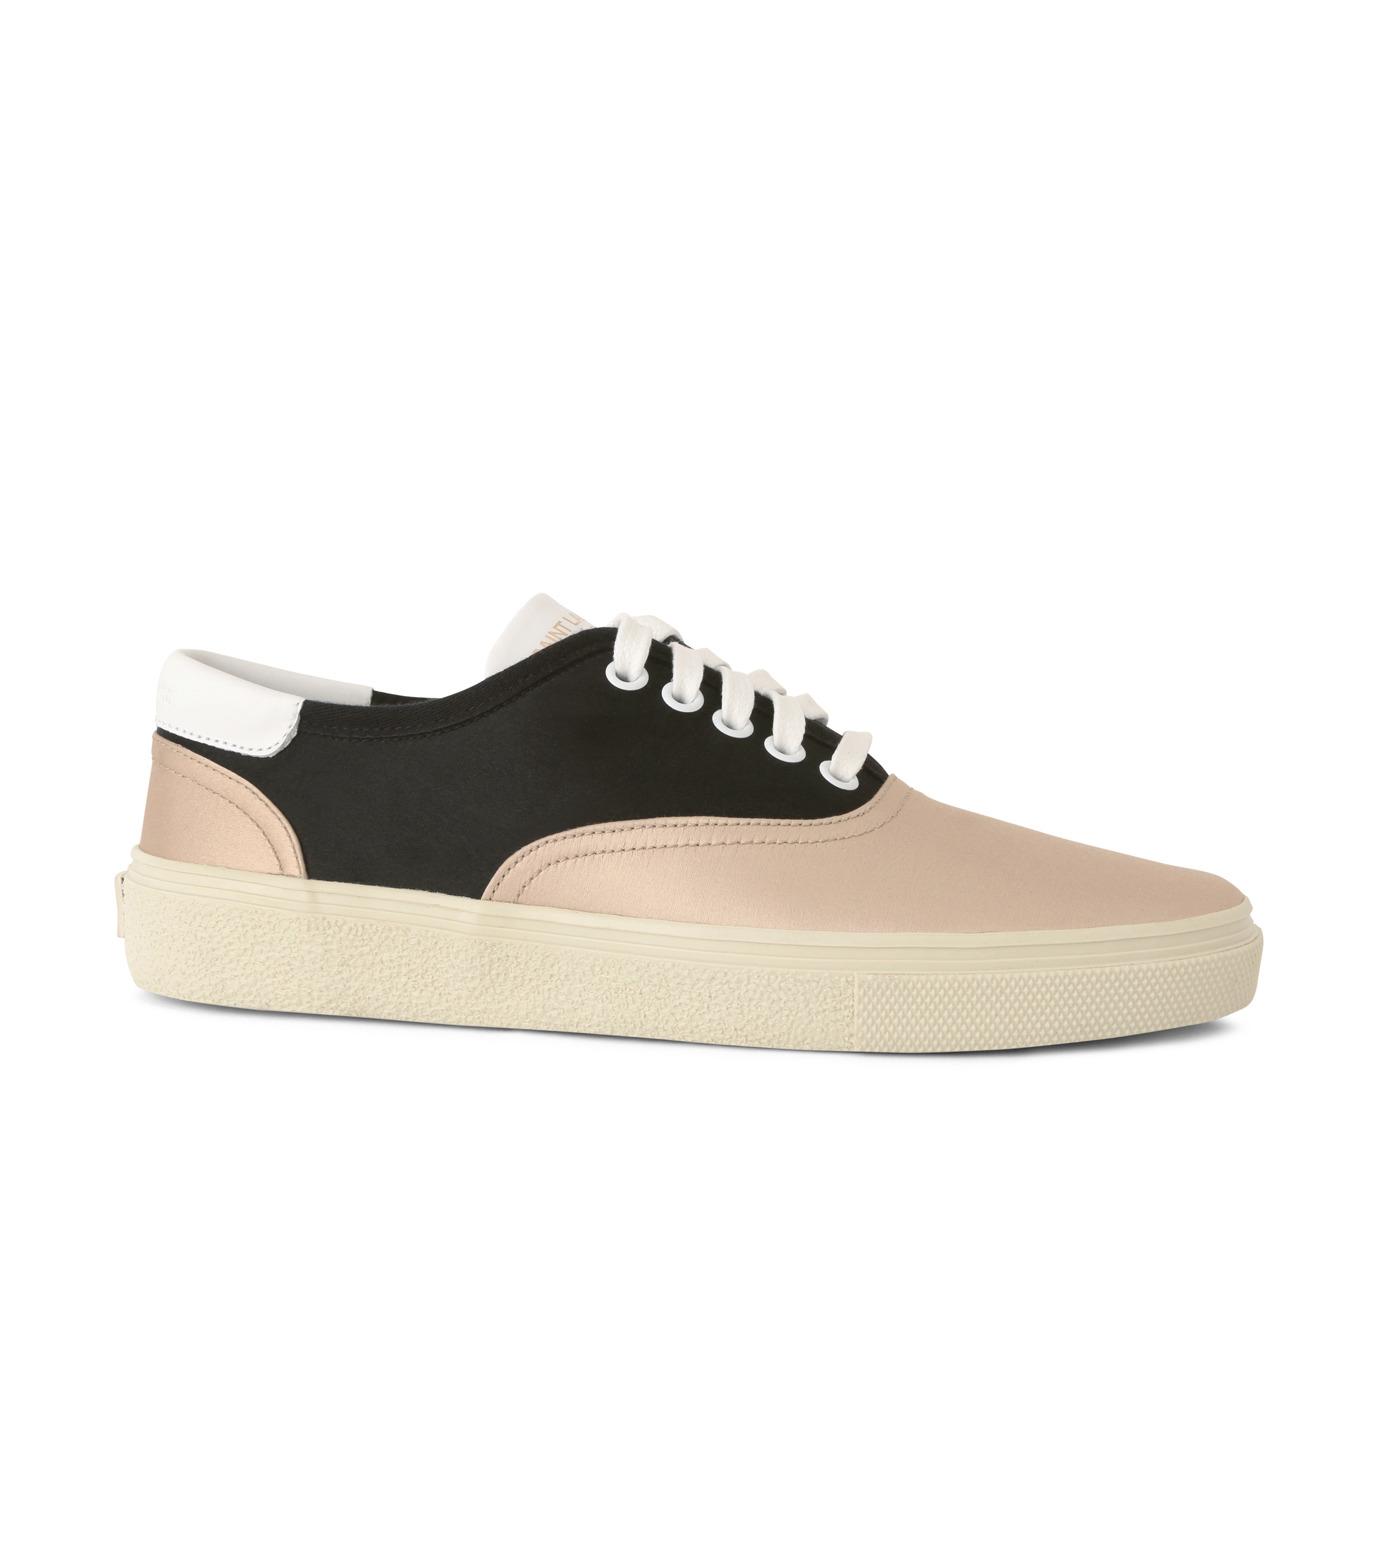 SAINT LAURENT(サンローラン)のSkate Sneaker Lace Up Satin-BEIGE(スニーカー/sneaker)-345062-F1430-52 拡大詳細画像1